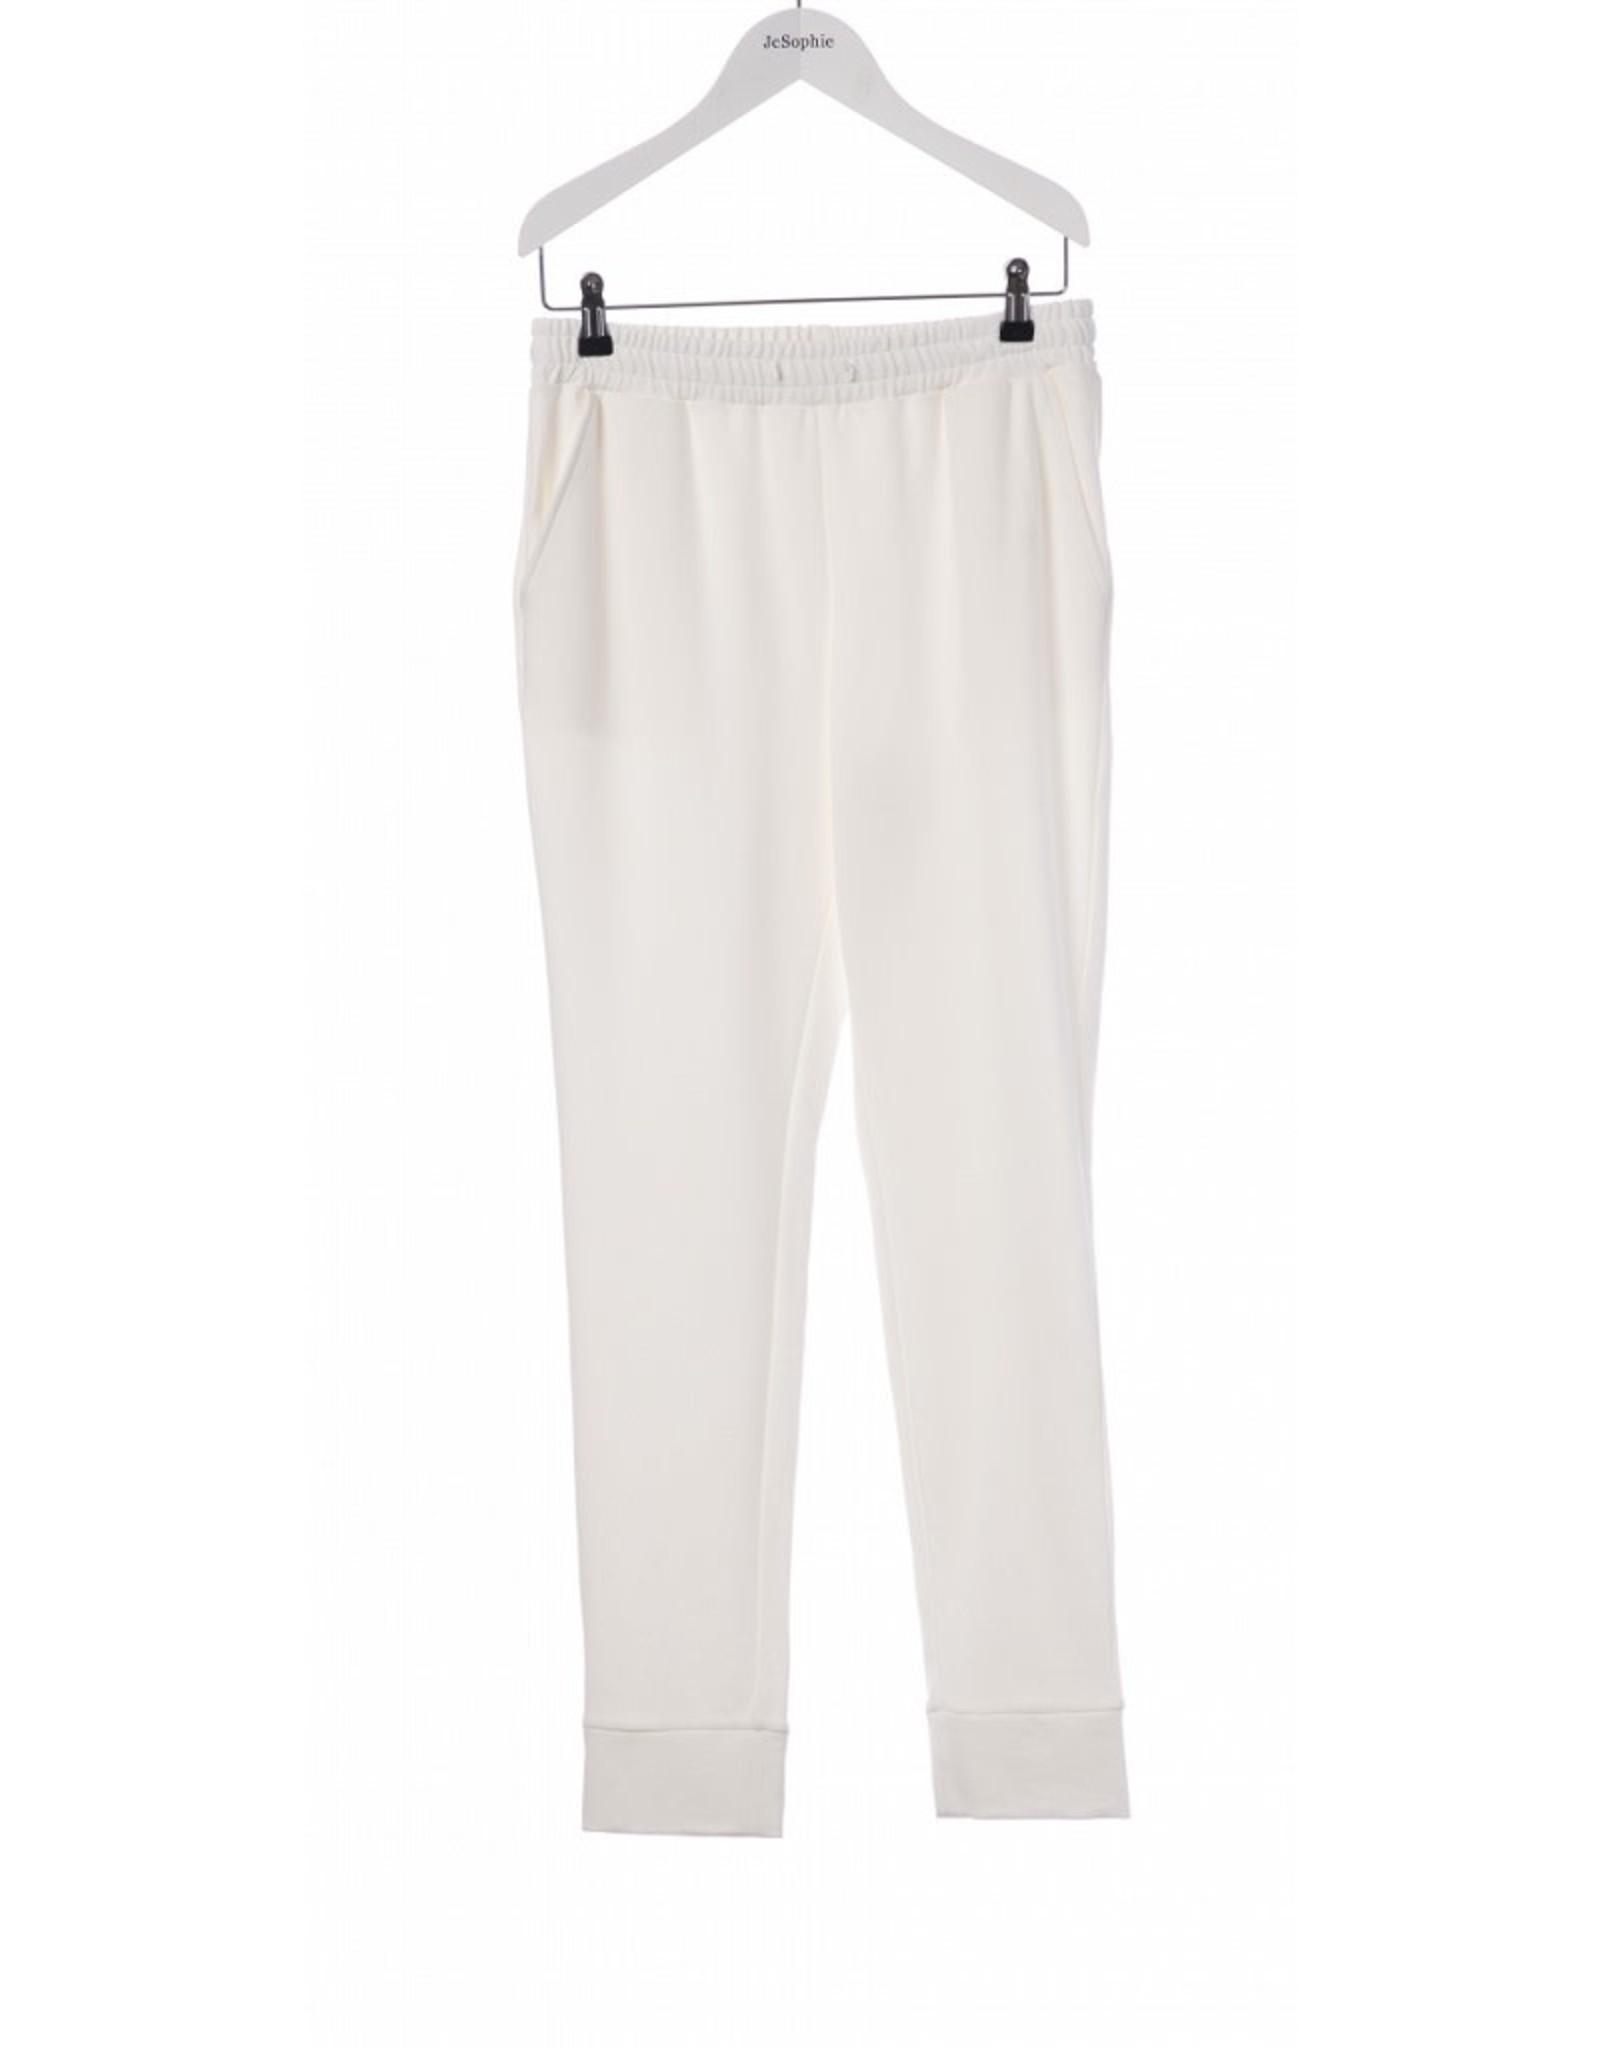 JcSophie JcSophie Gypsy trousers wit